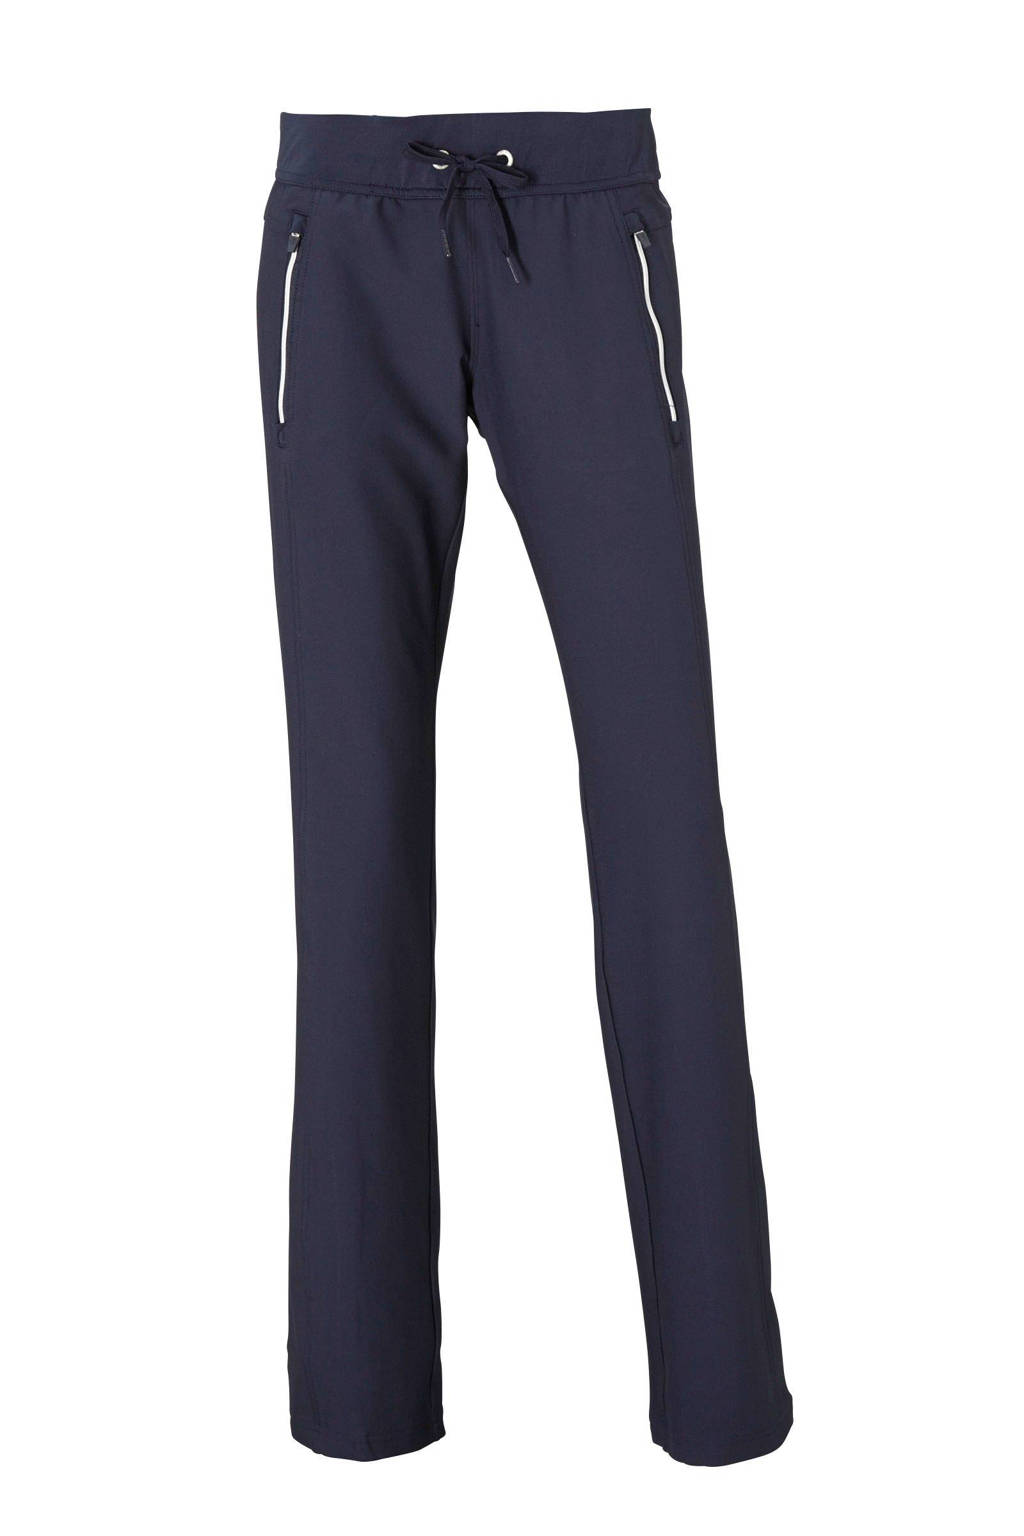 Sjeng Sports broek Gabriella donkerblauw, Donkerblauw